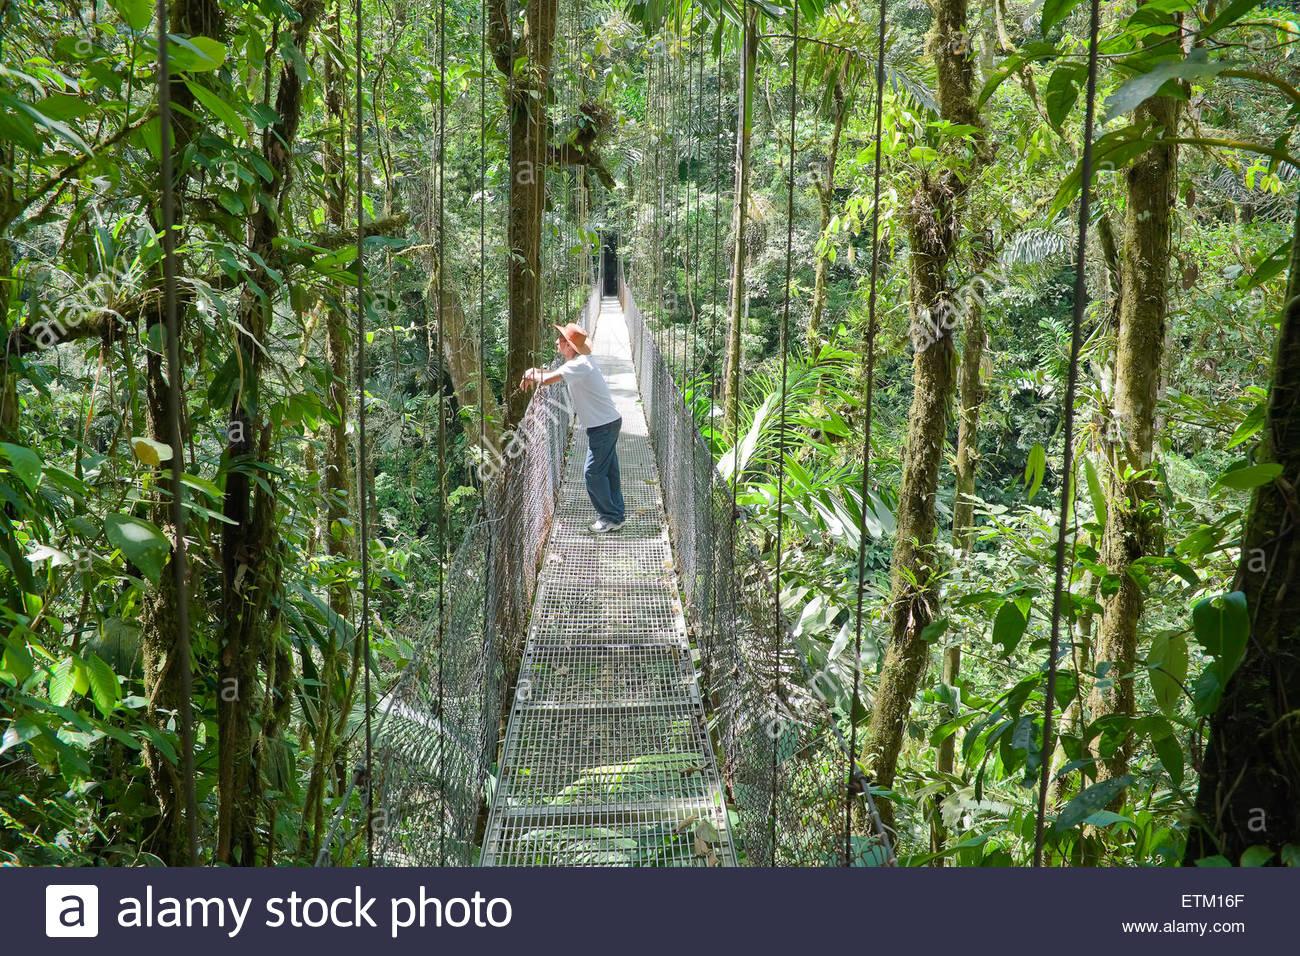 Man standing on hanging bridge in rainforest, La Fortuna, Alajuela Province, Costa Rica, Central America - Stock Image